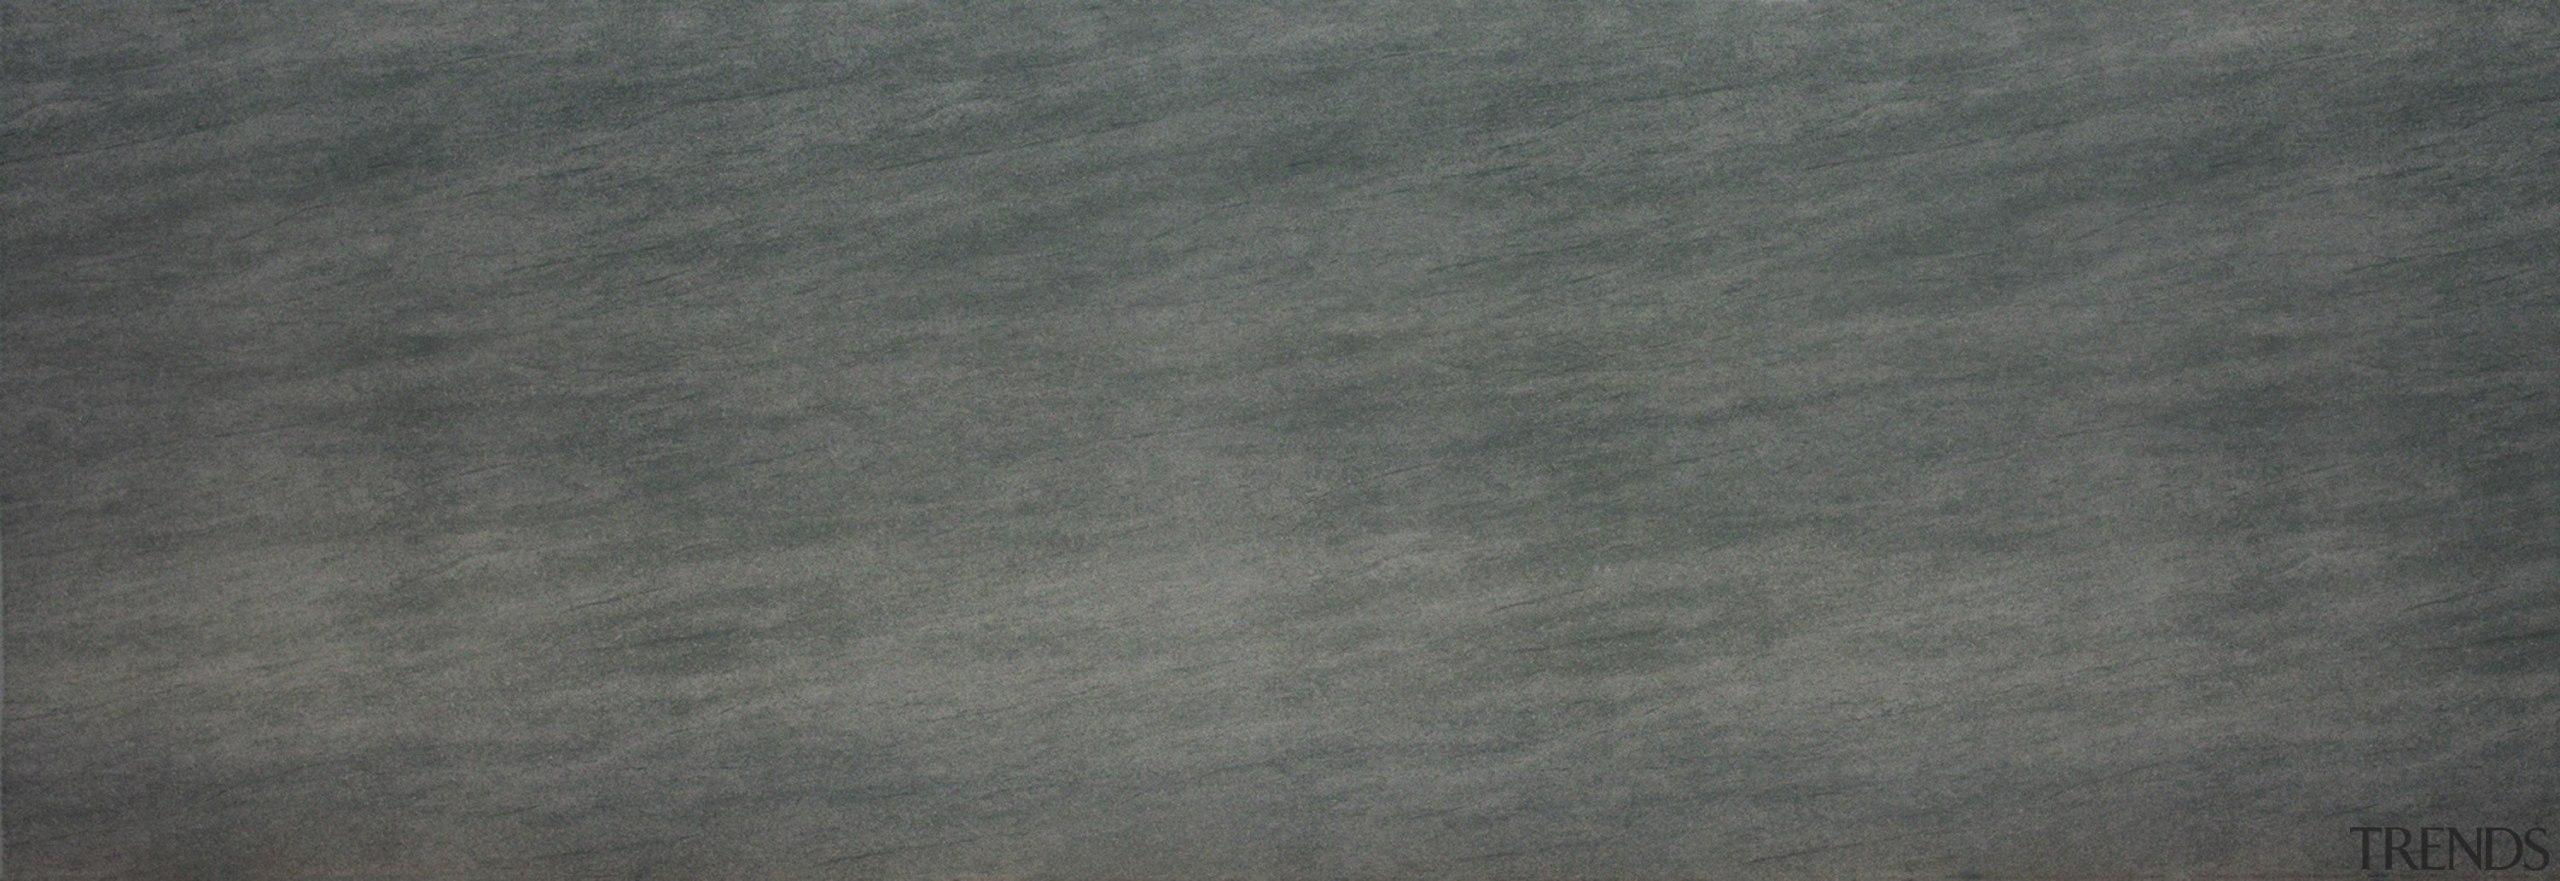 Basalt Grey - Basalt Grey - atmosphere   atmosphere, black, line, phenomenon, sky, texture, gray